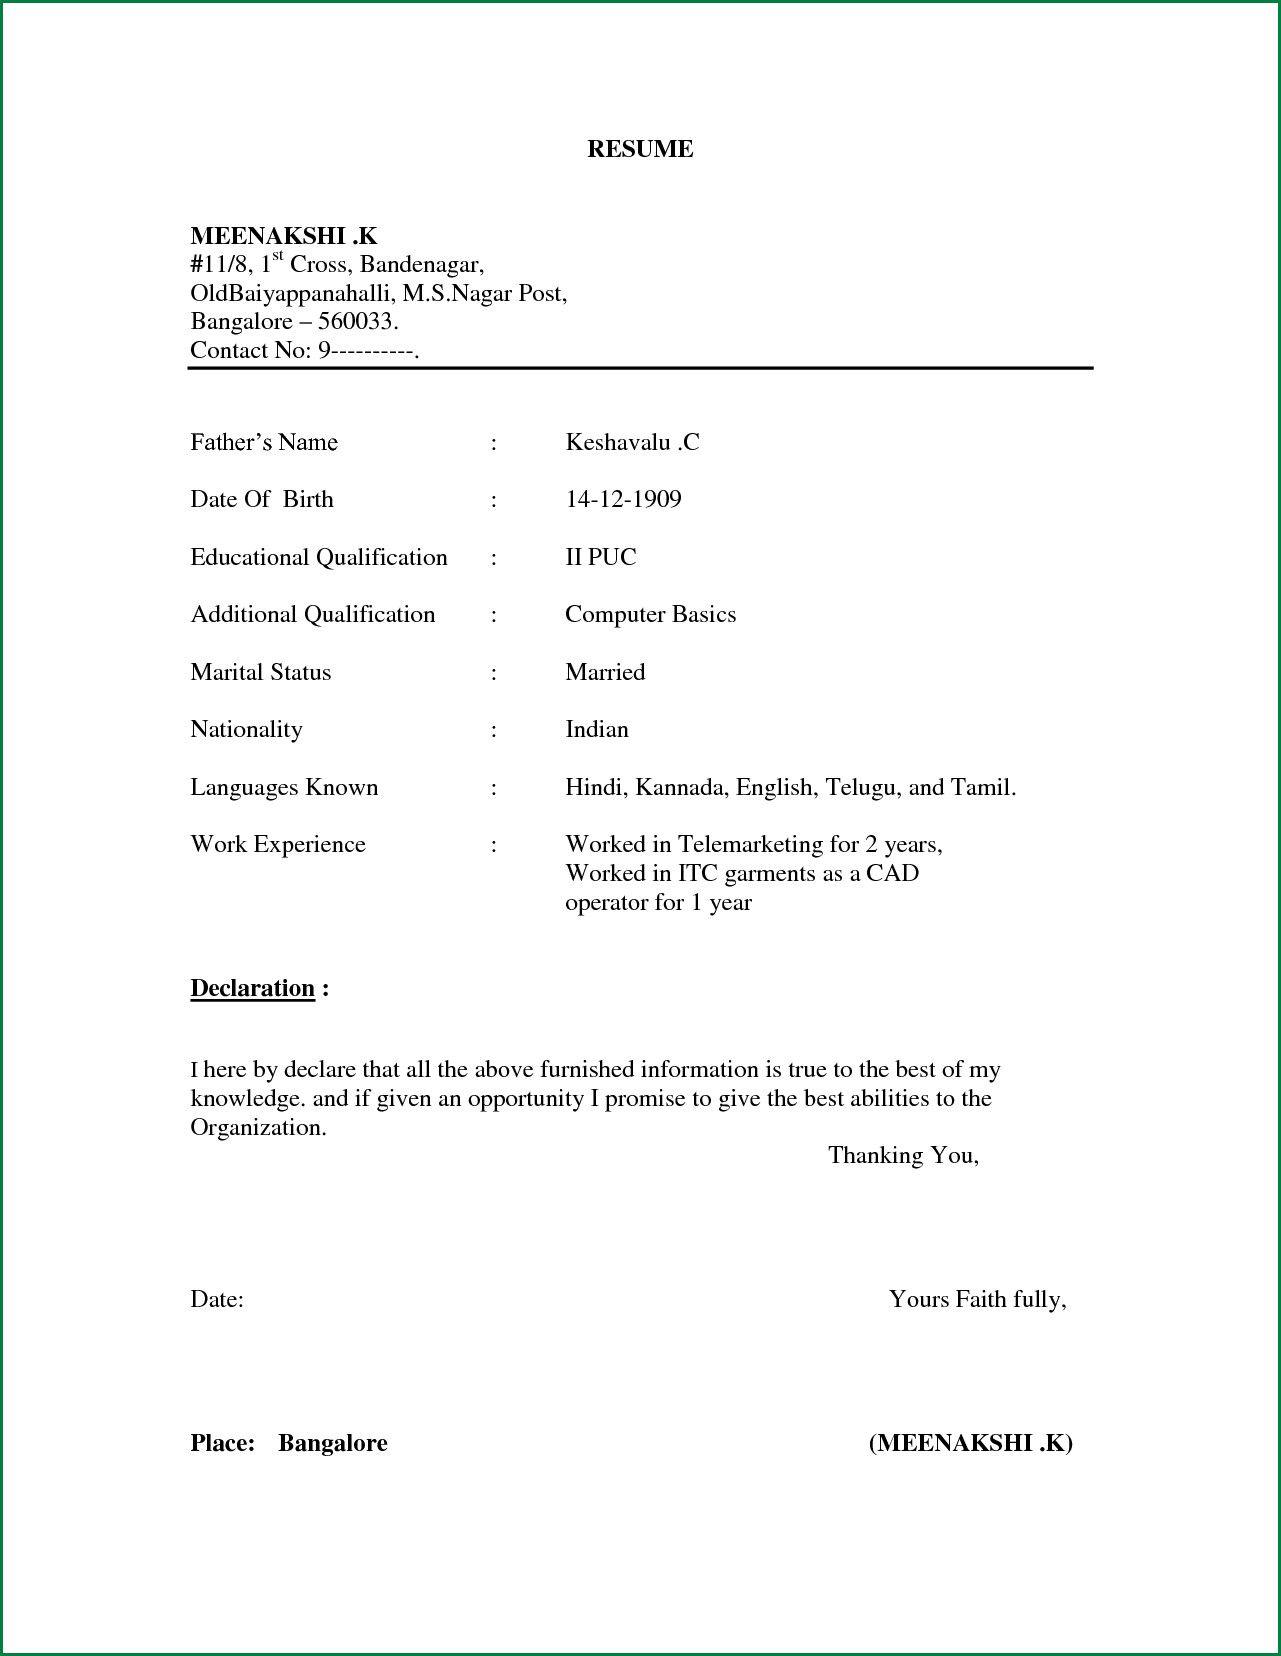 Resumes Free Download Pdf Format Fresh Simple Resume For And Resume Format Download Basic Resume Format Basic Resume